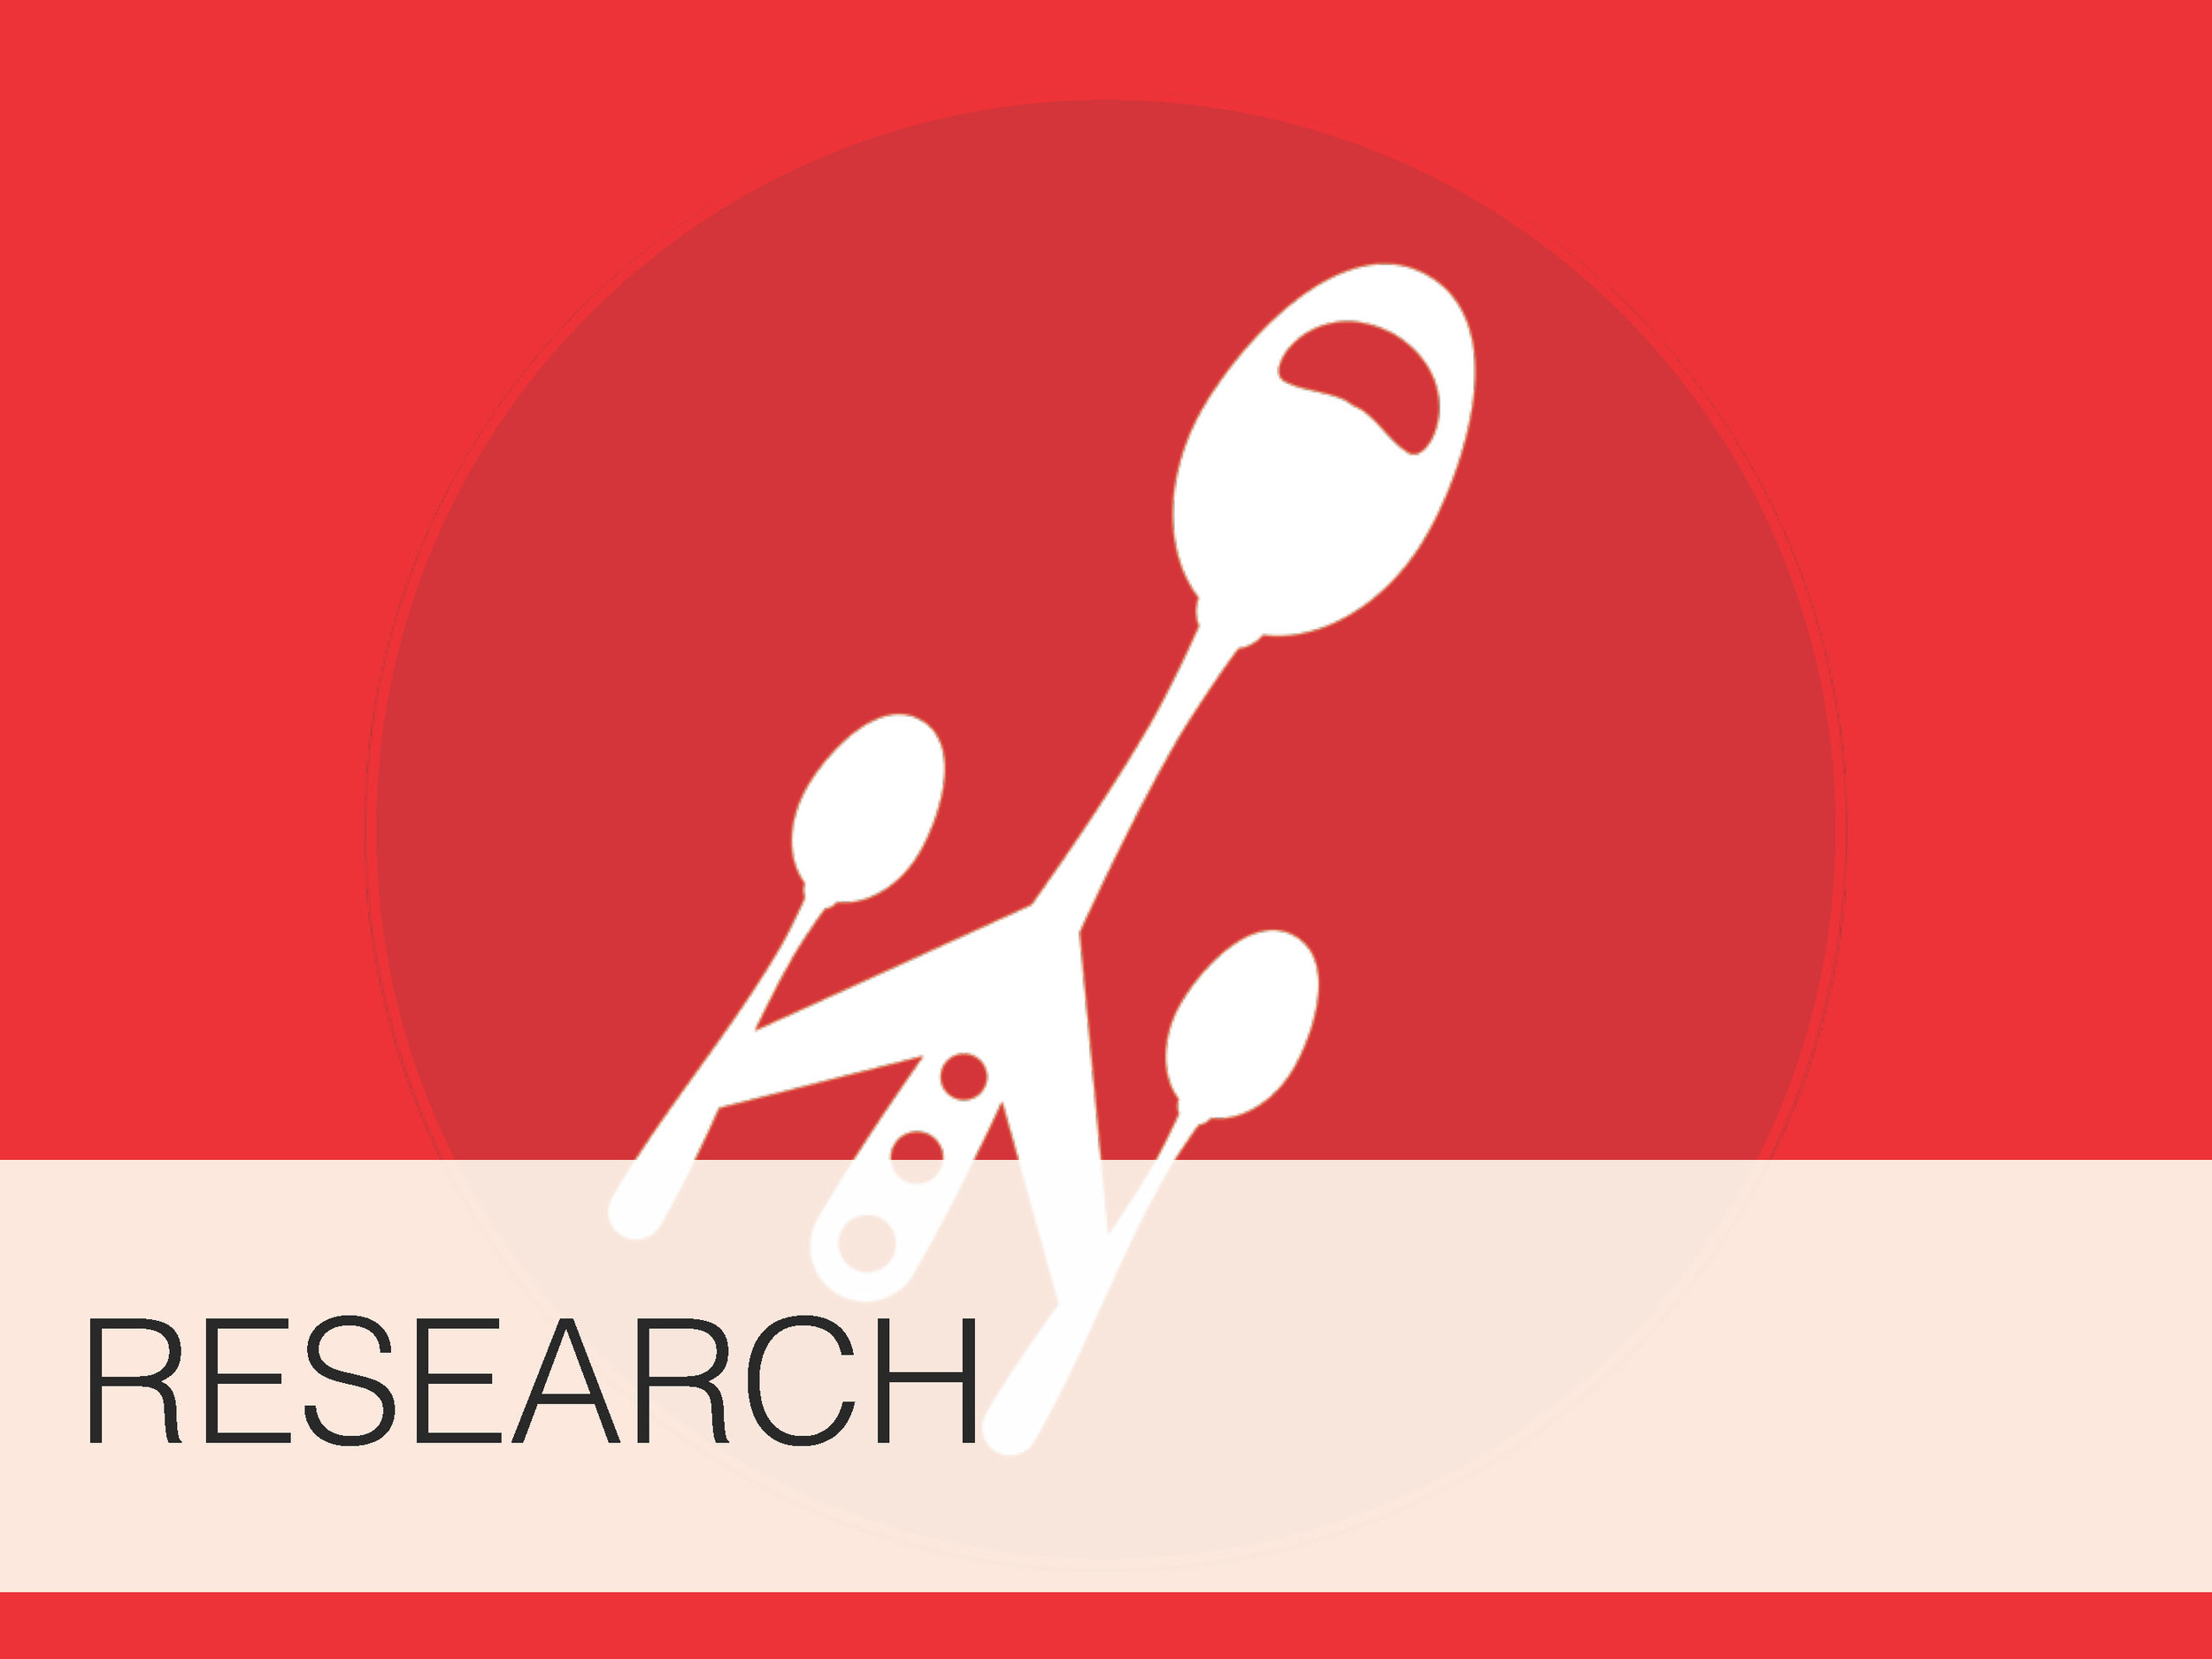 Project2_ResearchReadout_Final_Prez_Spoonrocket-novideo_Page_07.jpg